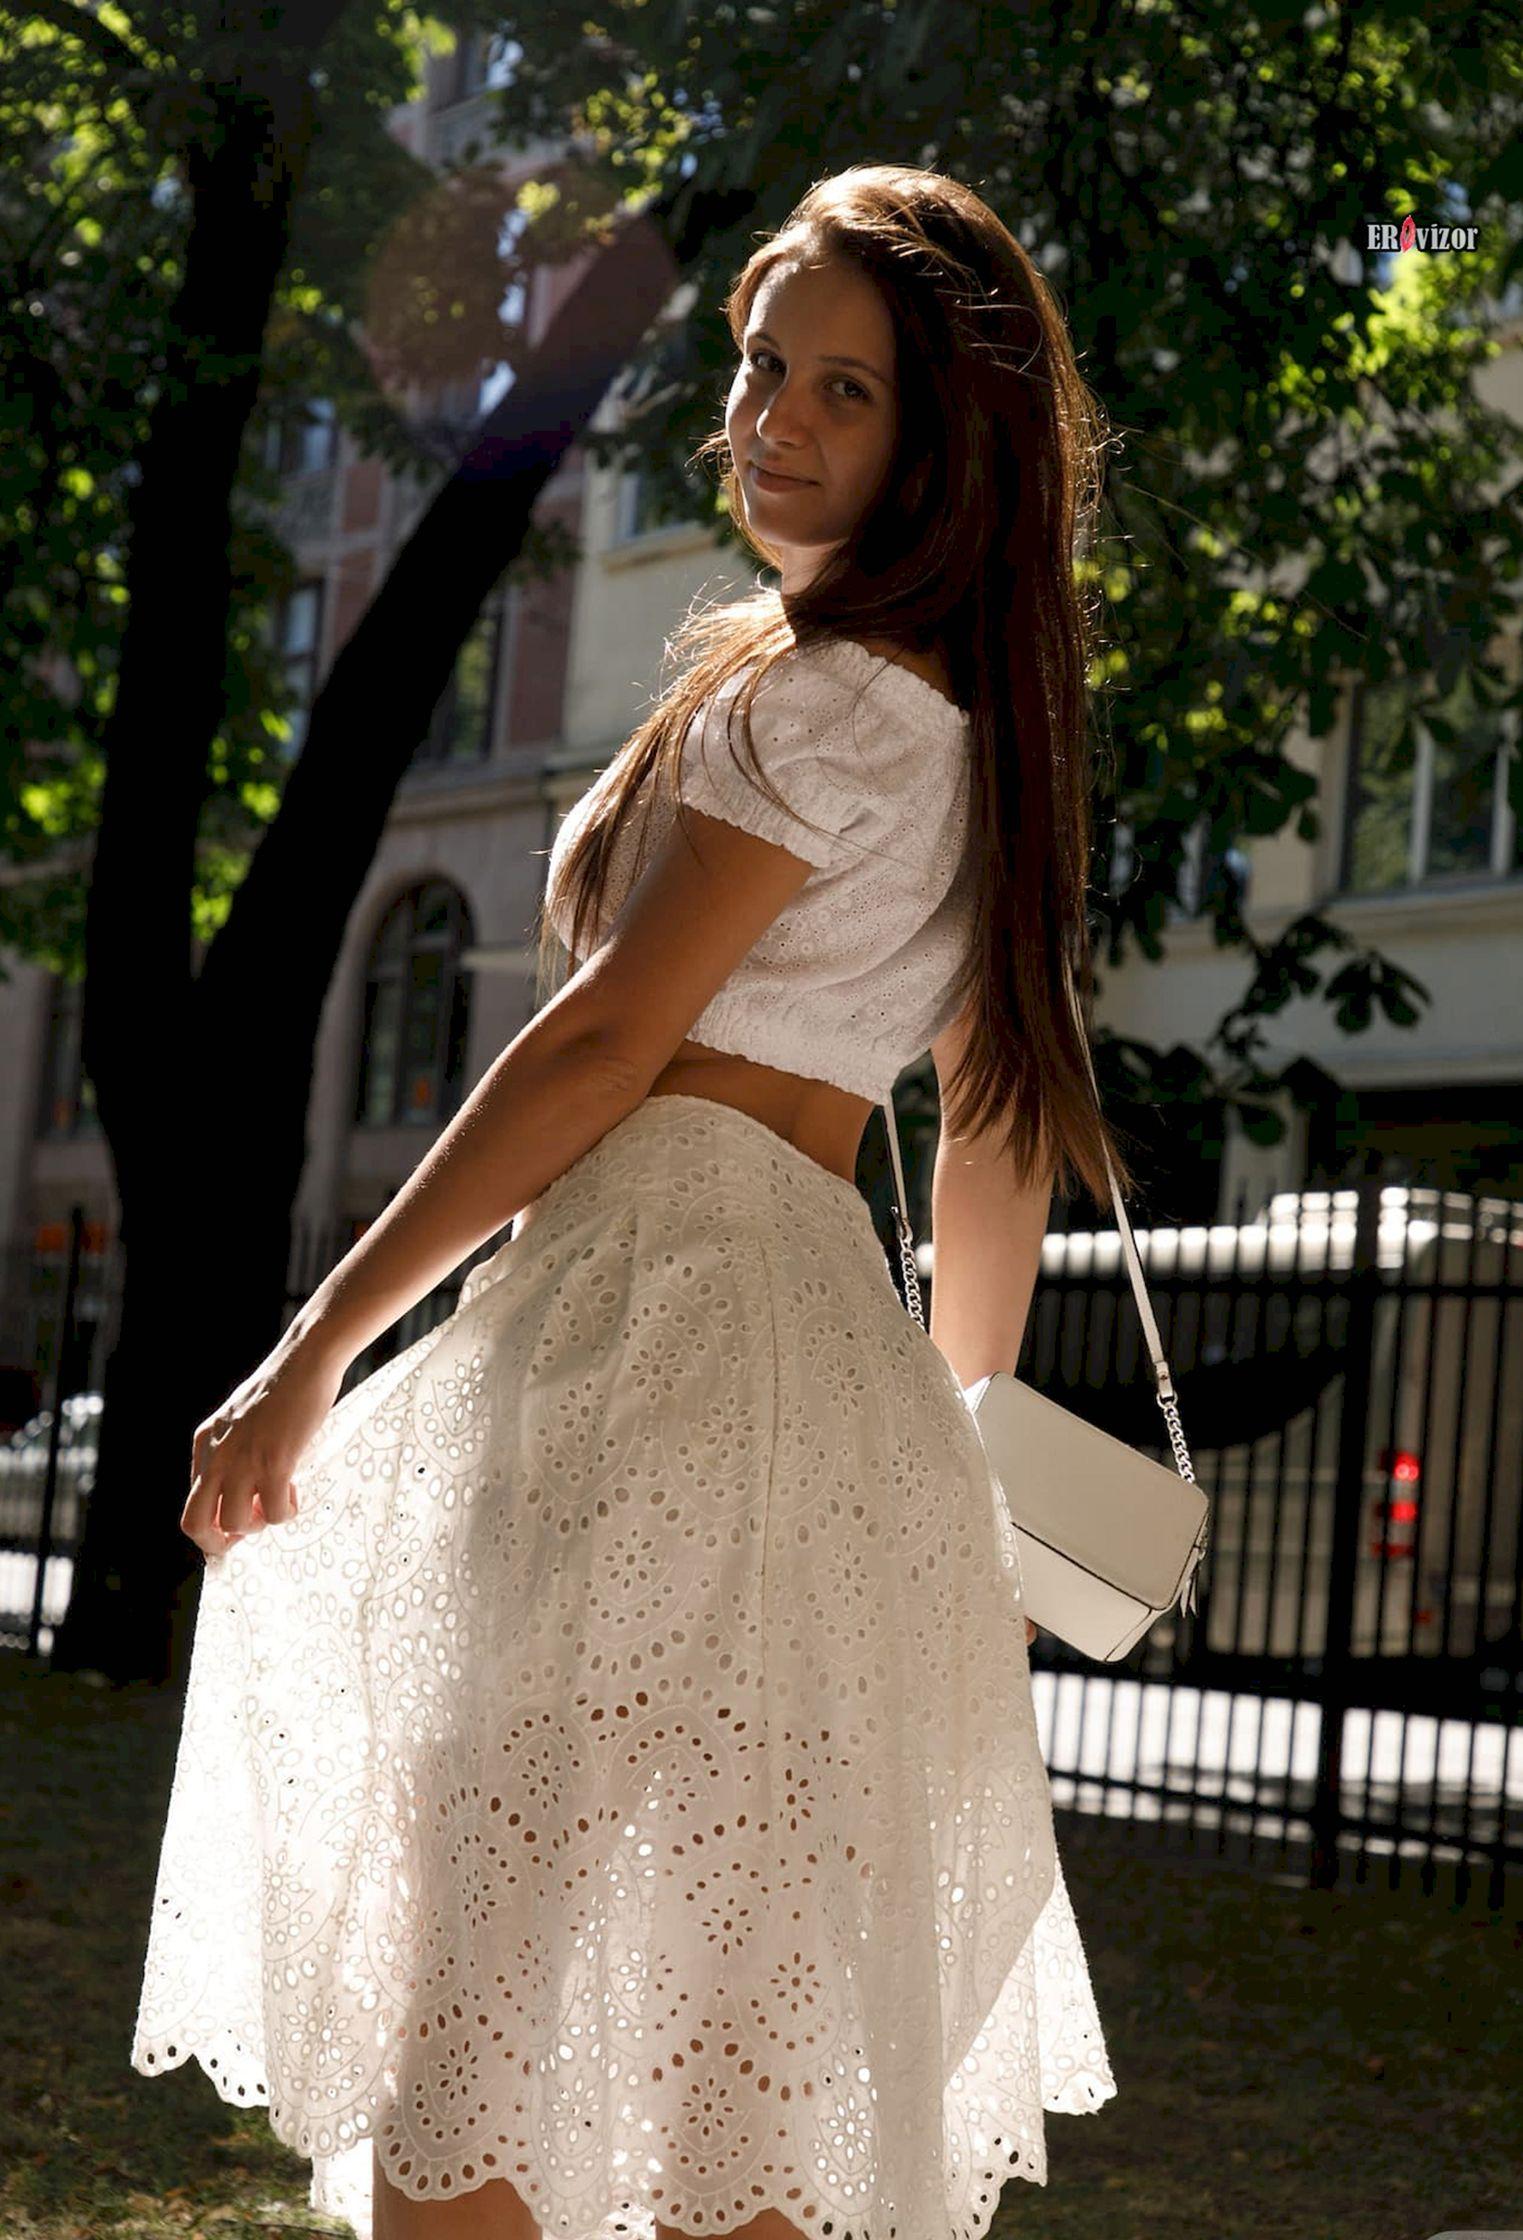 Jessica-Albanka_ero_foto (5)